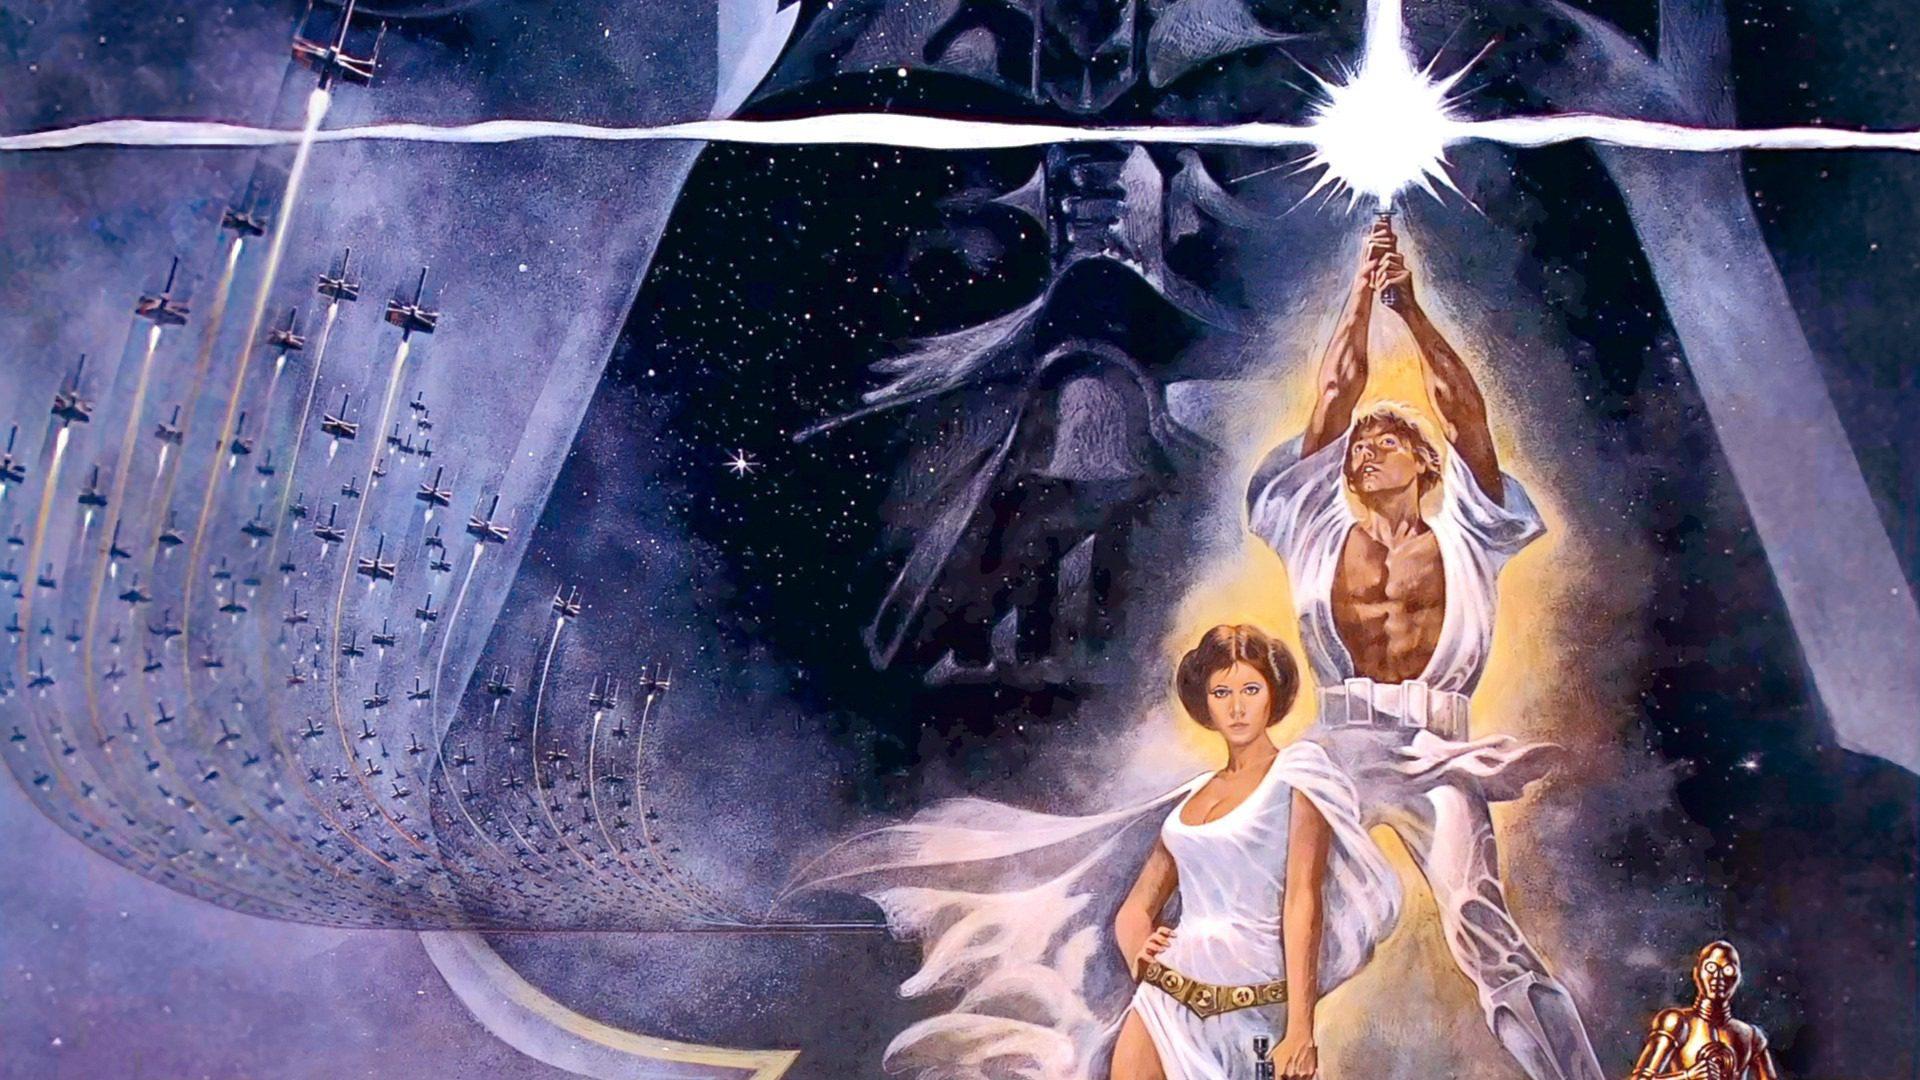 Confirmed Epic Podcast #108: Our Favorite Star Wars Films